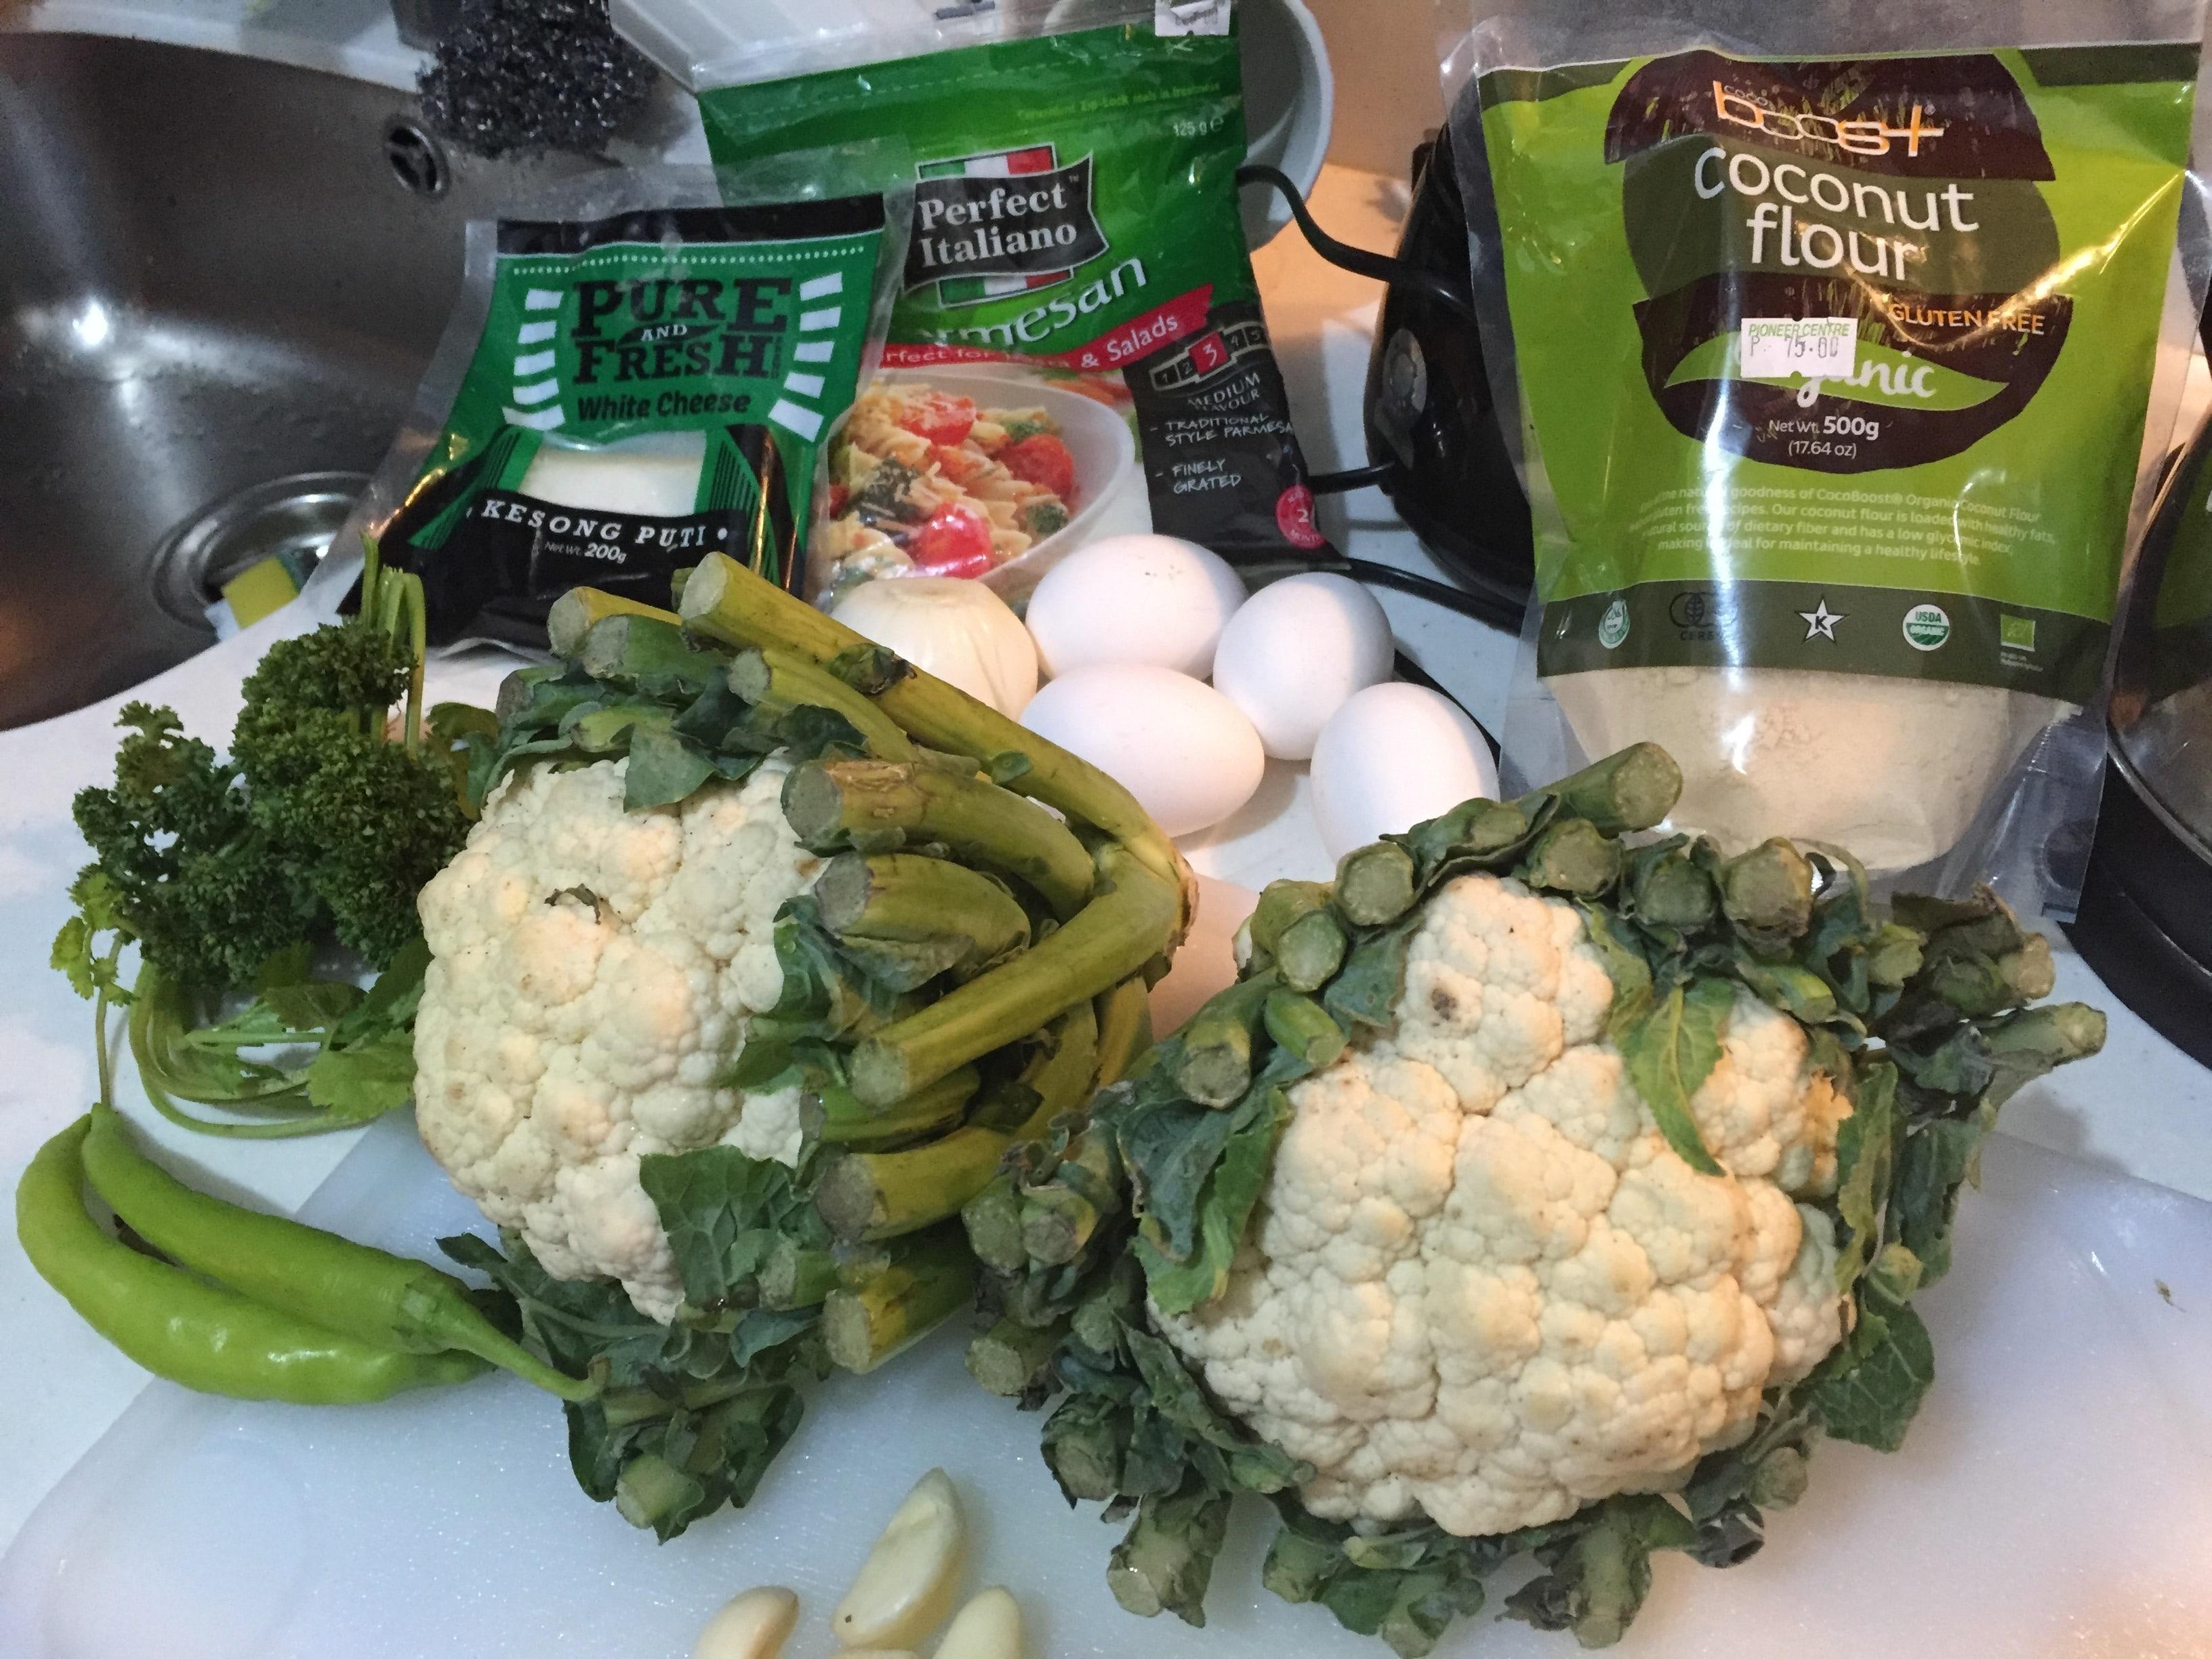 Cauliflower Broccoli